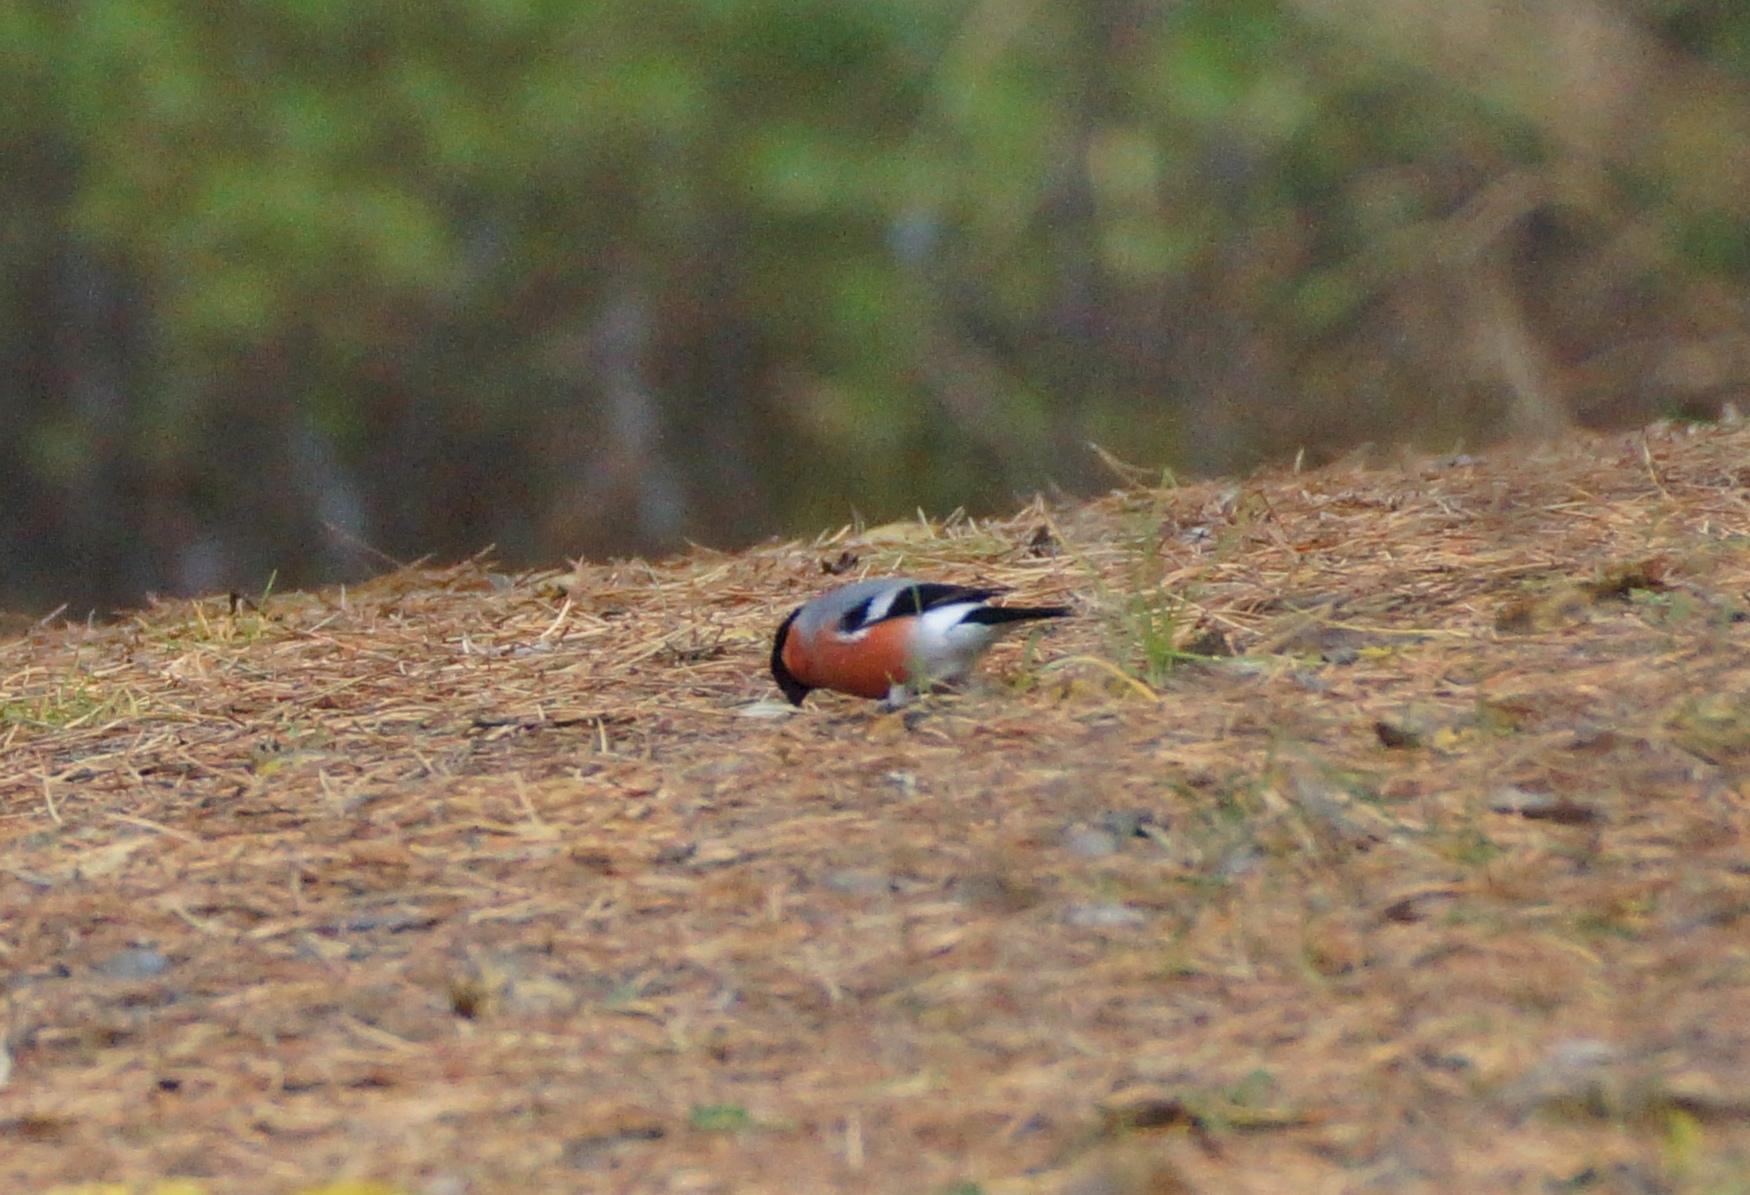 Птицы активно кормятся опавшими плодами деревьев